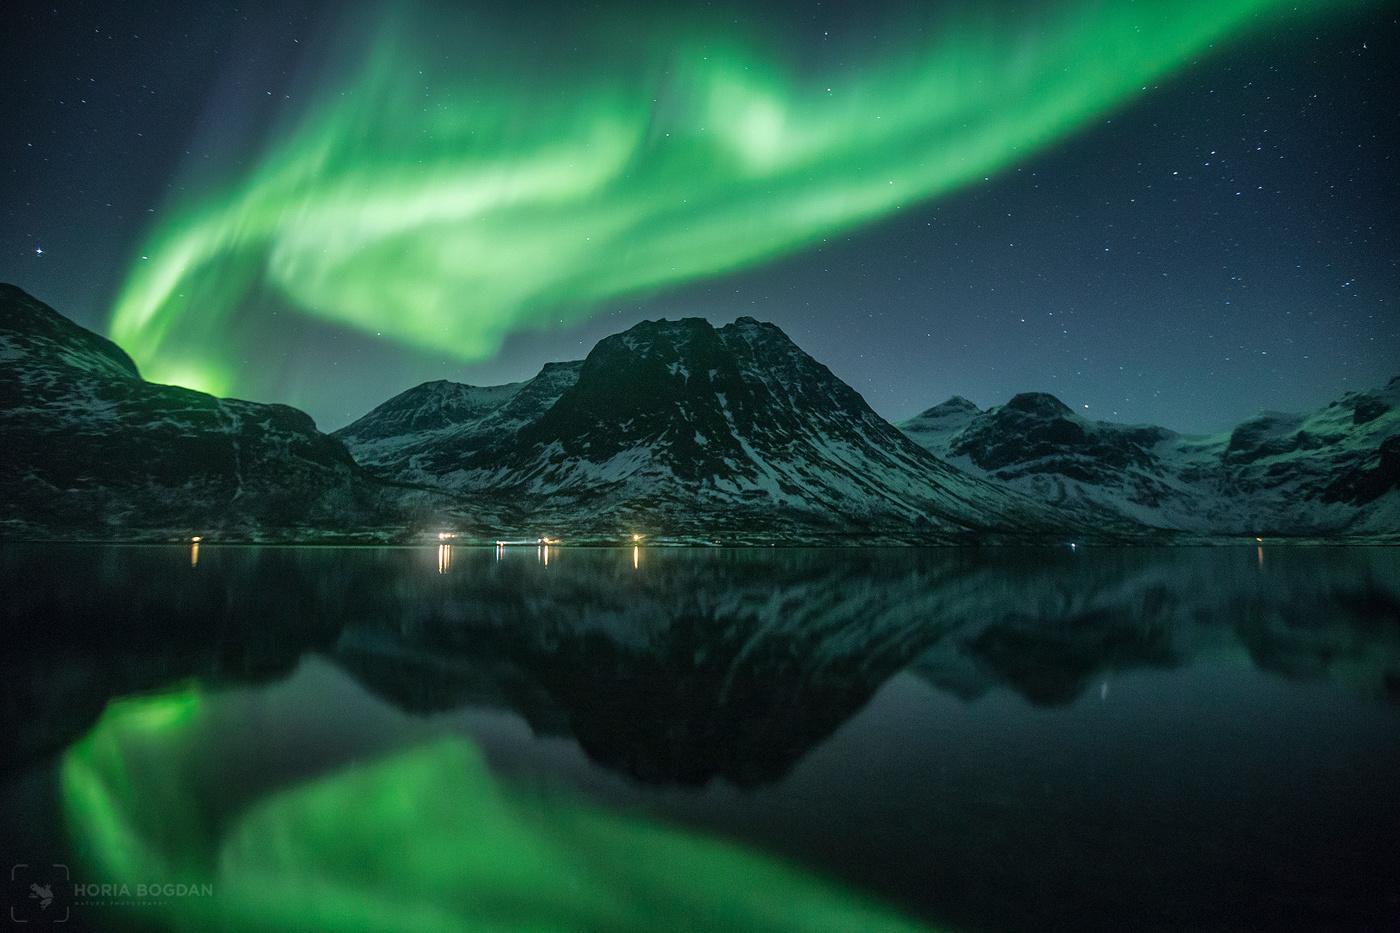 Grotfjord reflections by Horia Bogdan